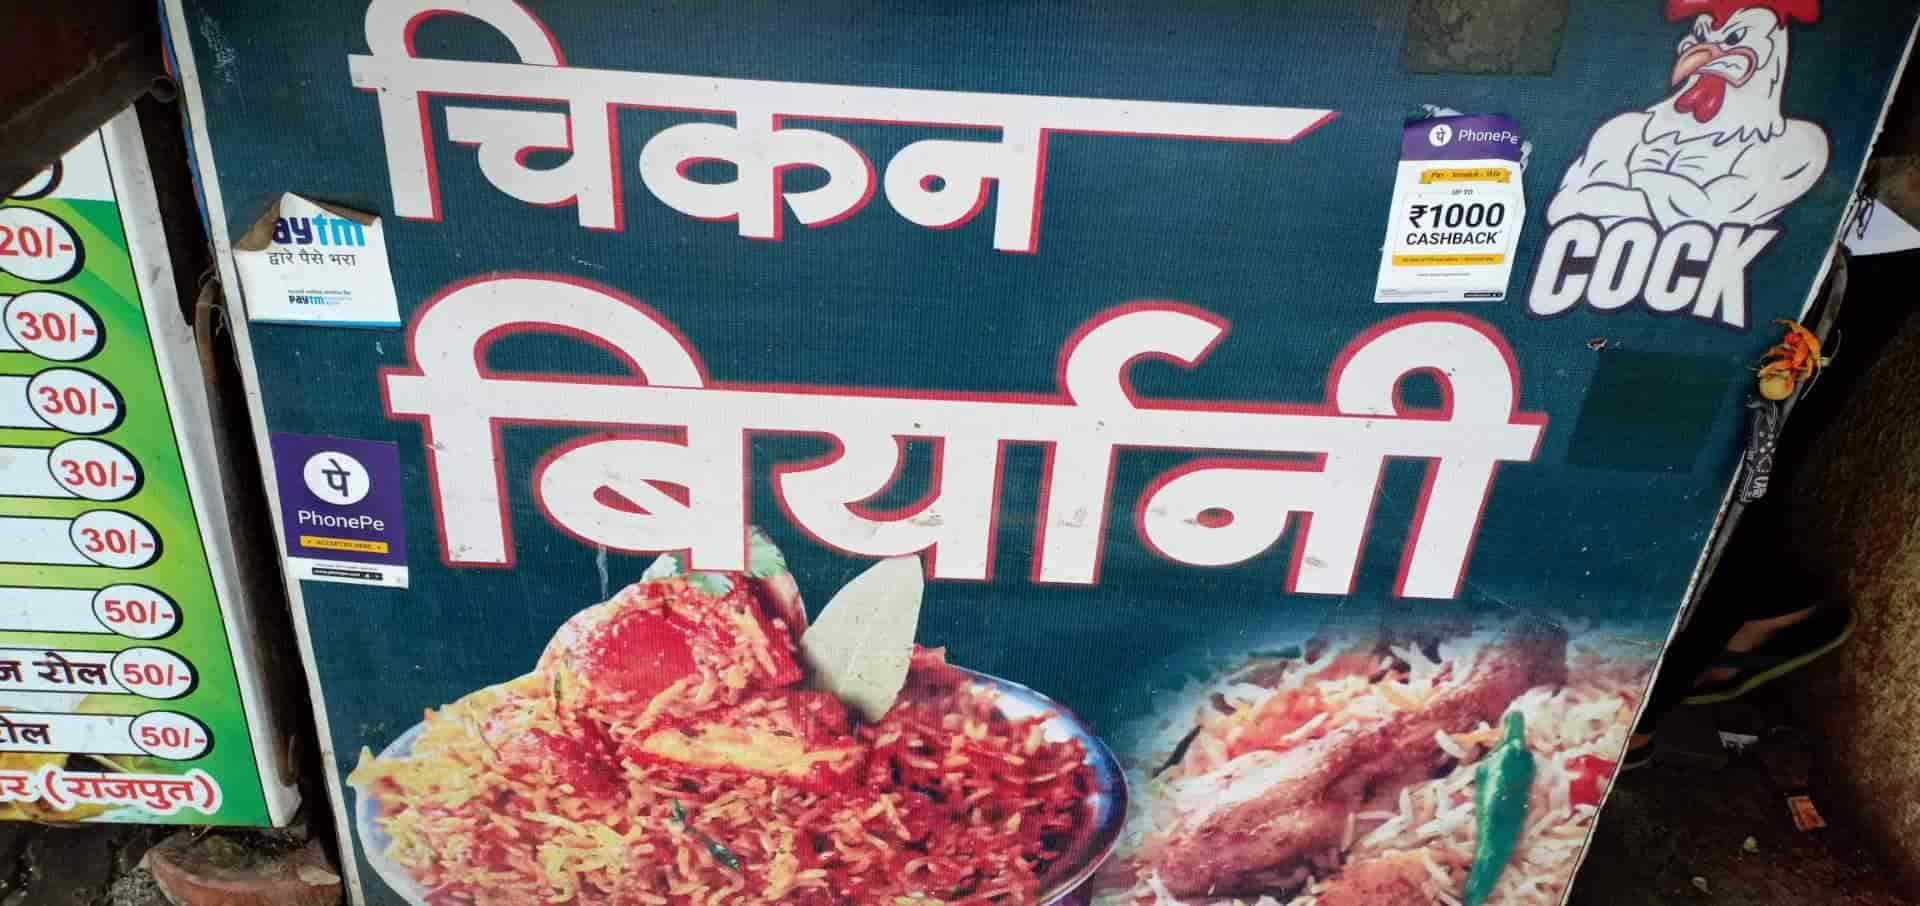 Sachin Biryani Centre, Trimurti Chowk - Restaurants in Nashik - Justdial